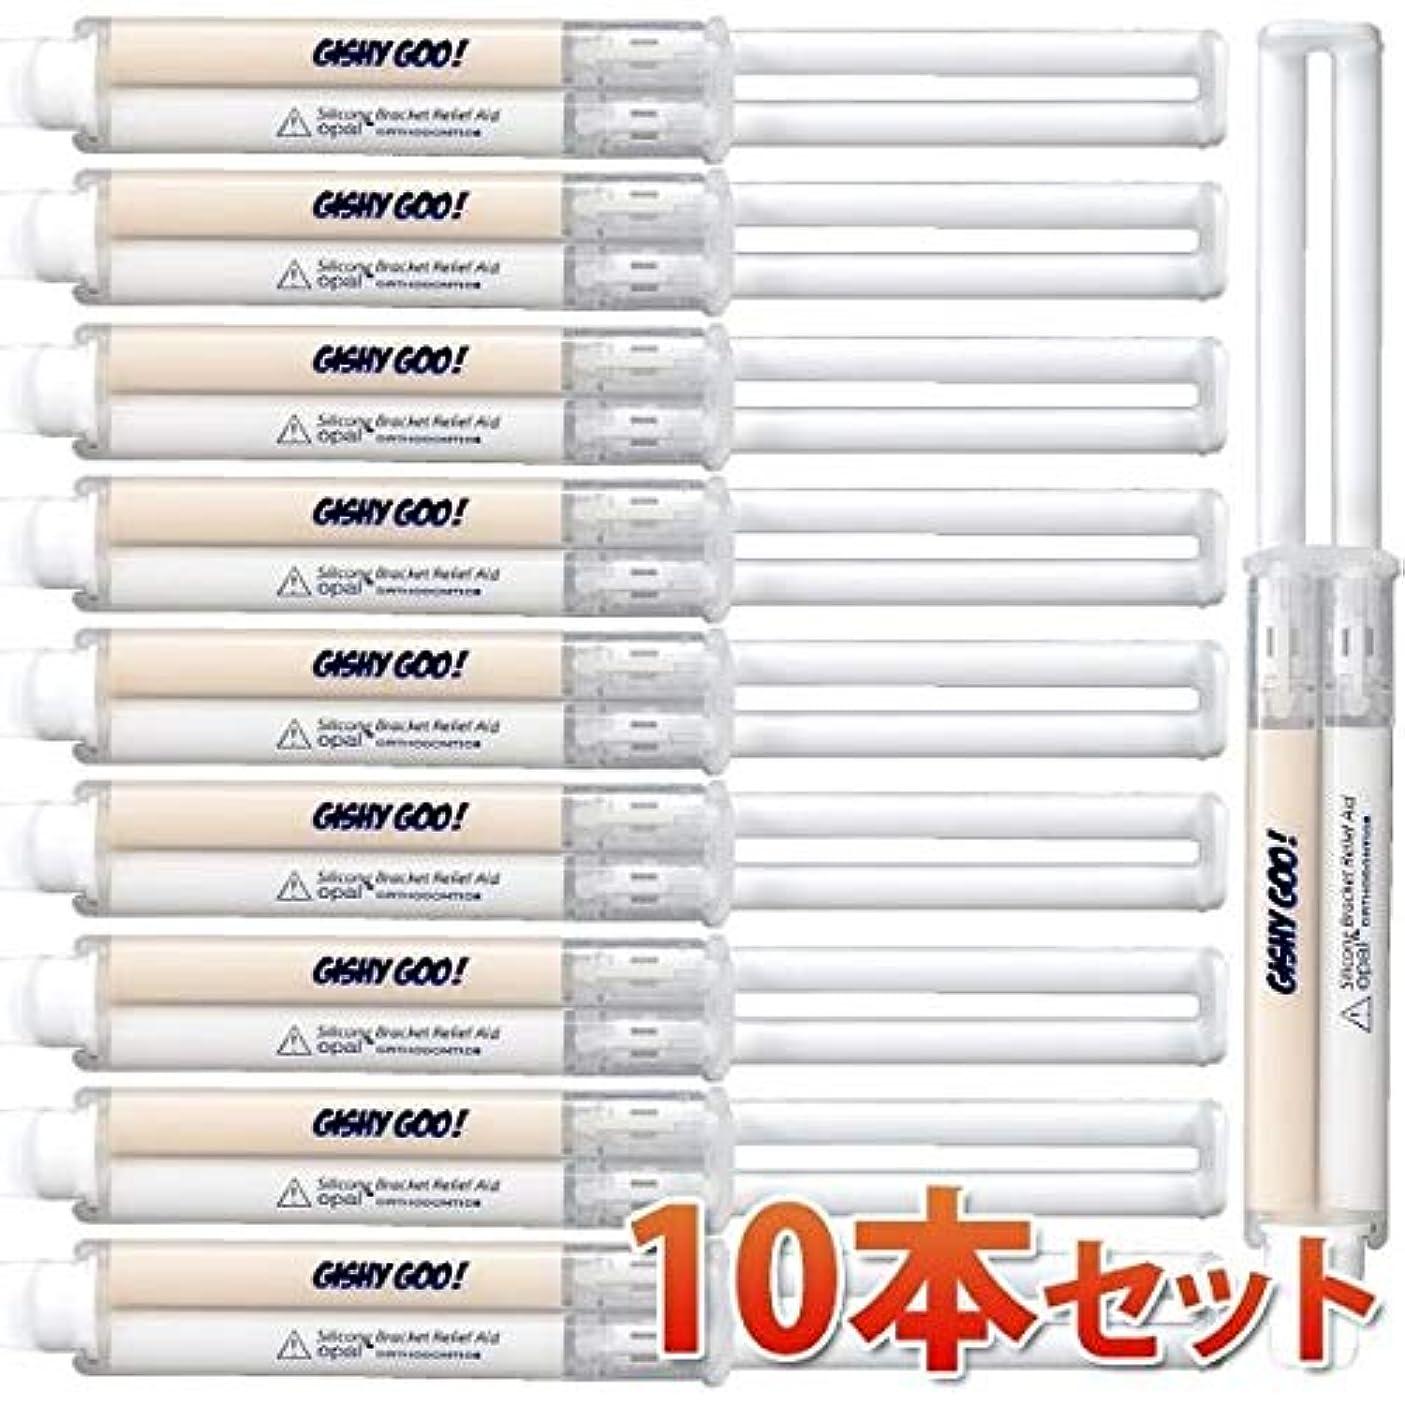 GISHY GOO(ギシ グー)ホワイト 10本(5ml/本)